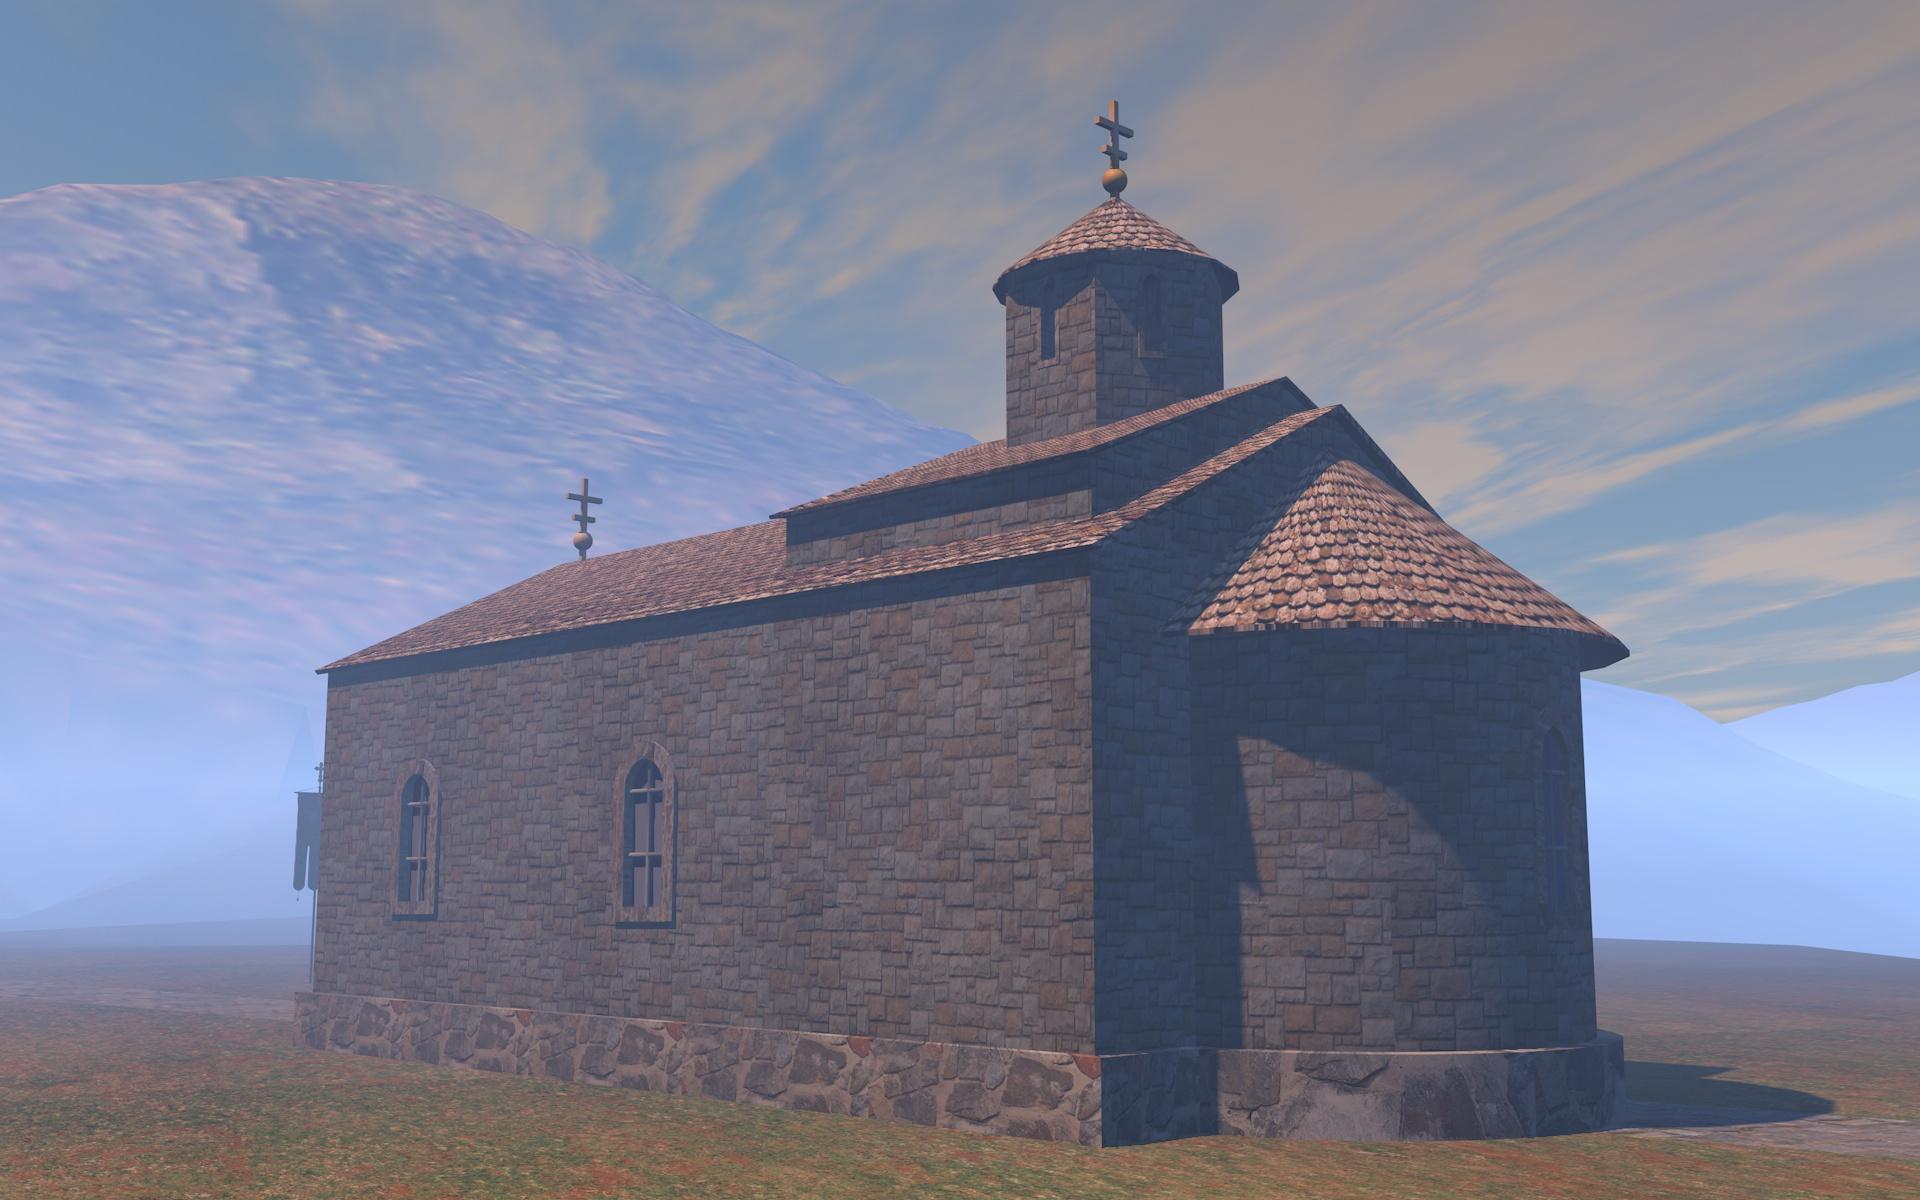 Otkriveni temelji manastira u Rožnju. Rozanj3a